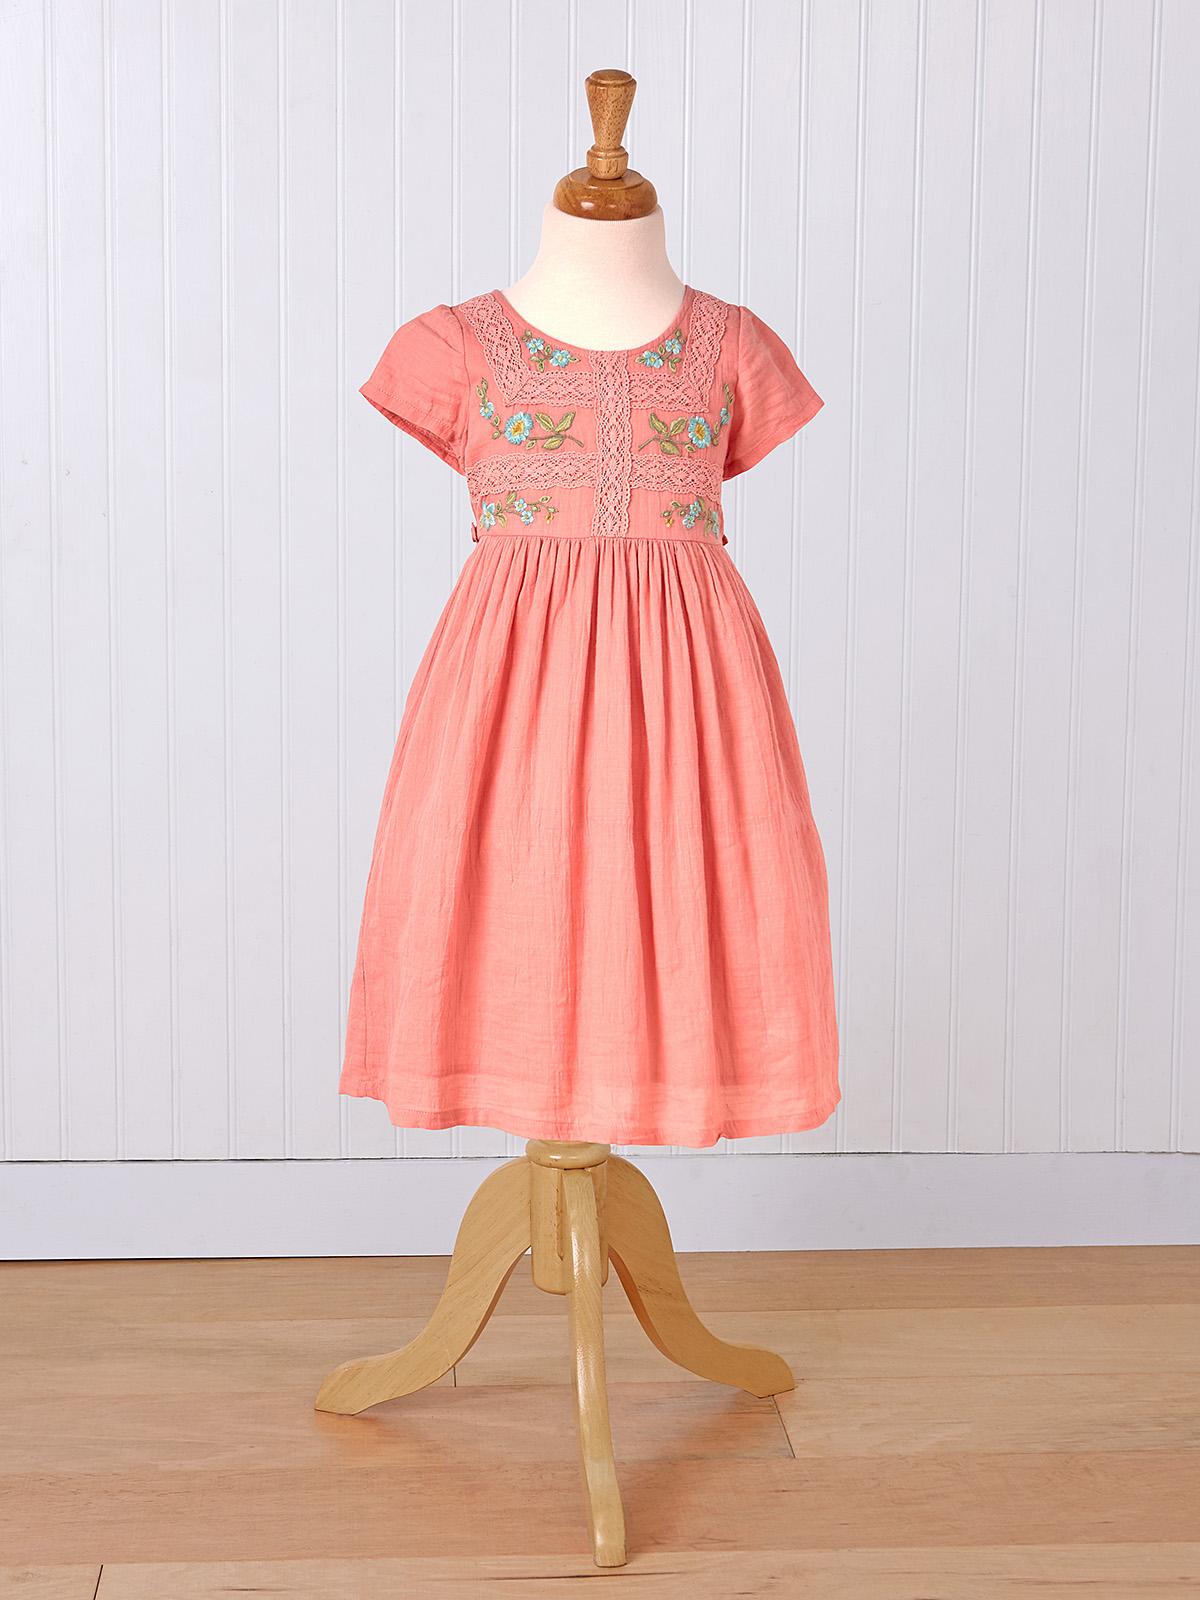 Rosa Girls Dress